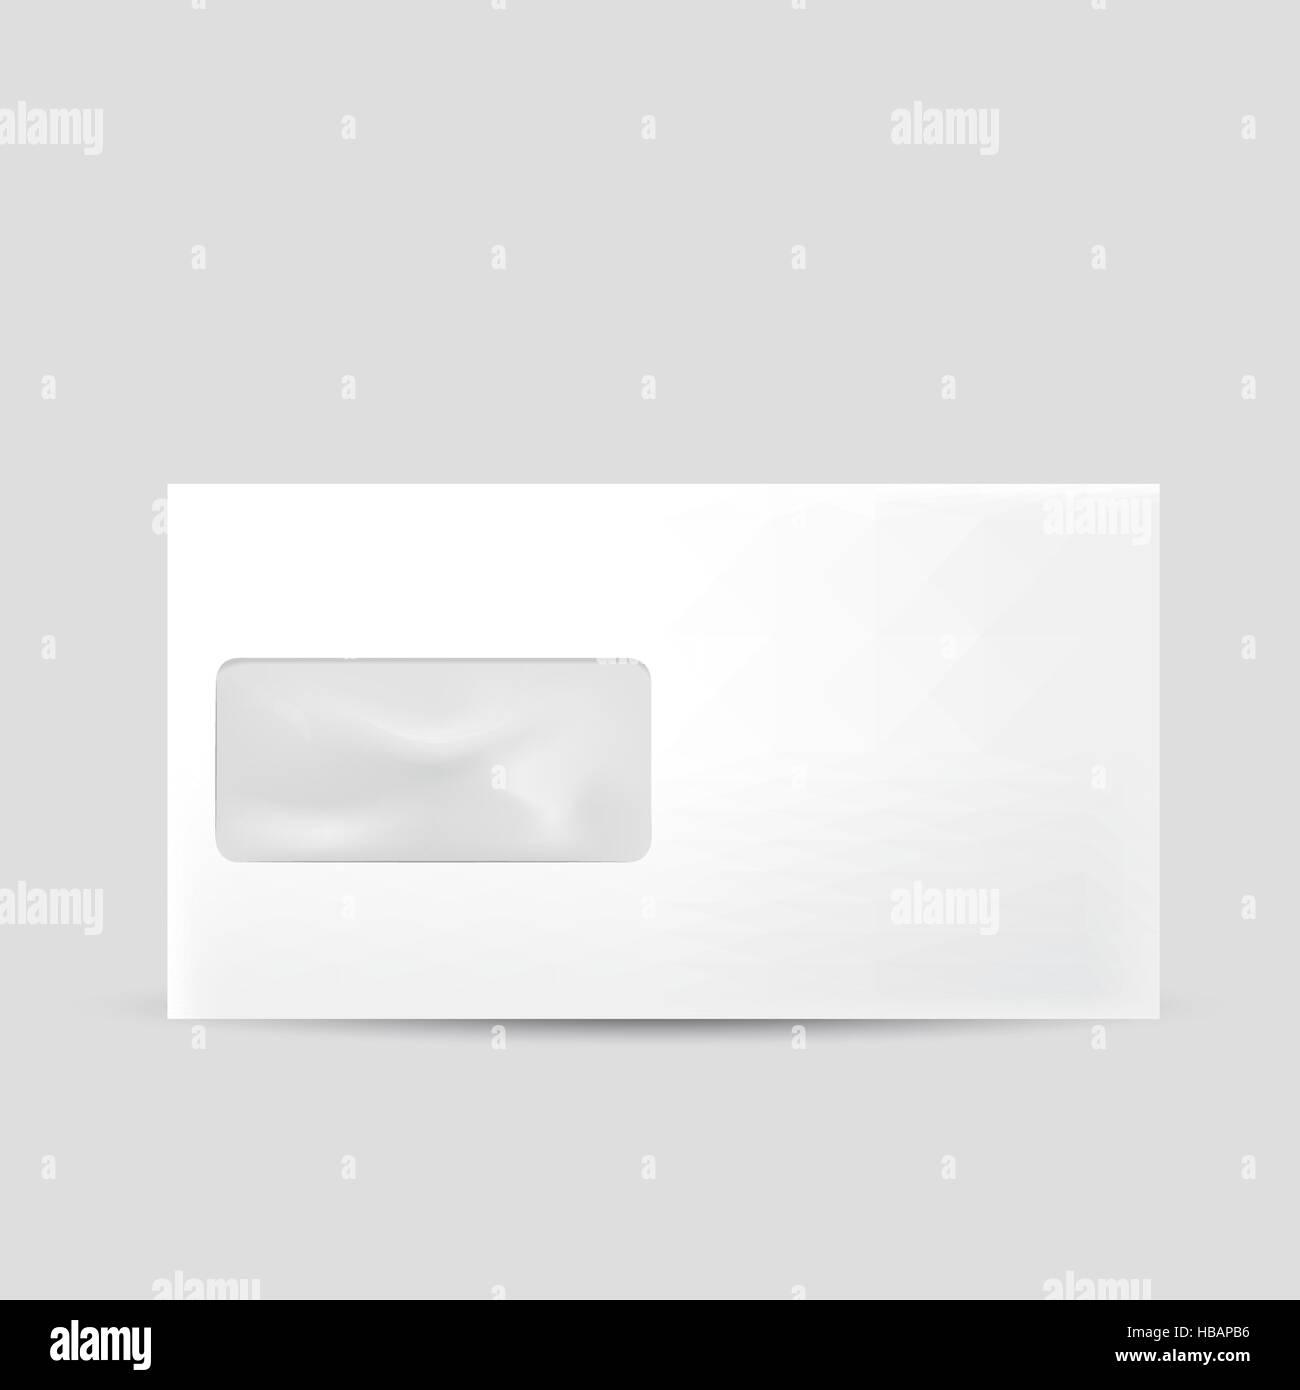 blank envelope with window isolated on grey background - Stock Image